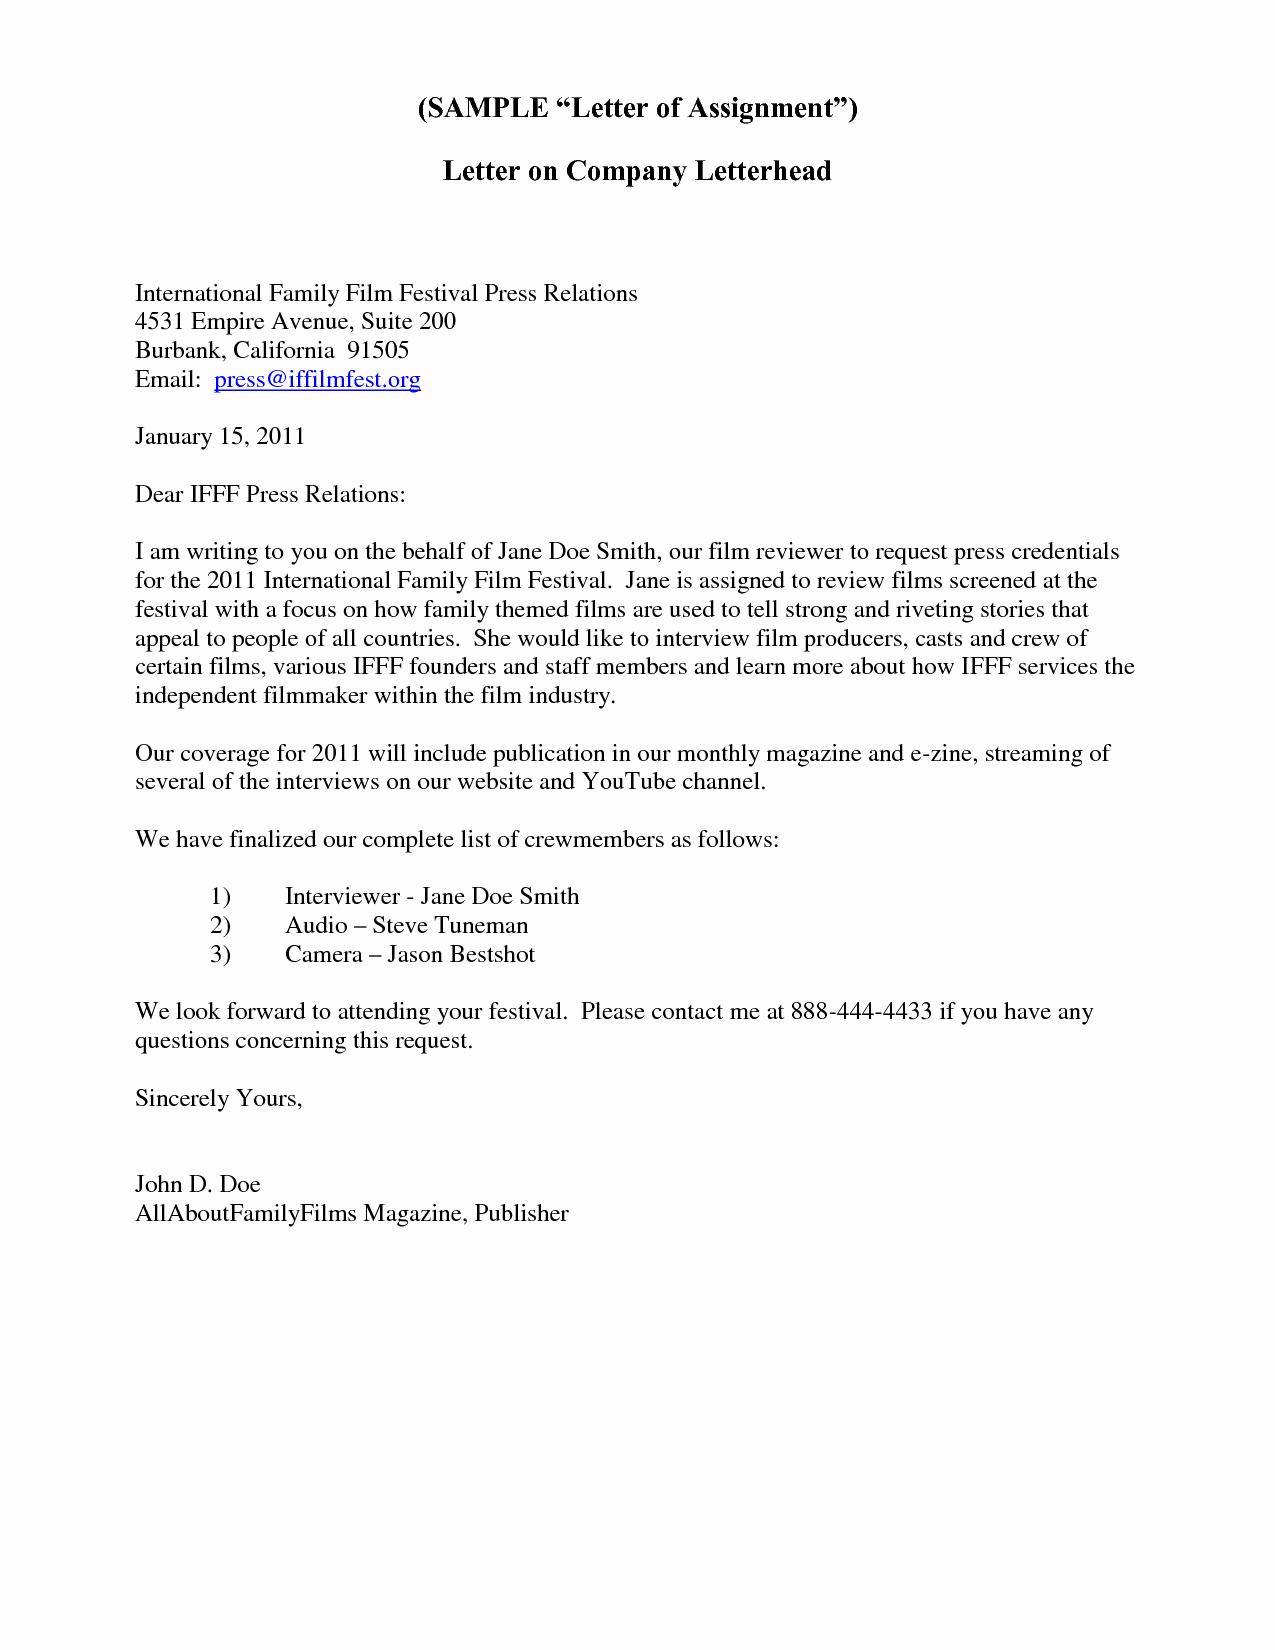 Notary Public Letter Template Elegant Best S Of Notary Public Letter format assignment